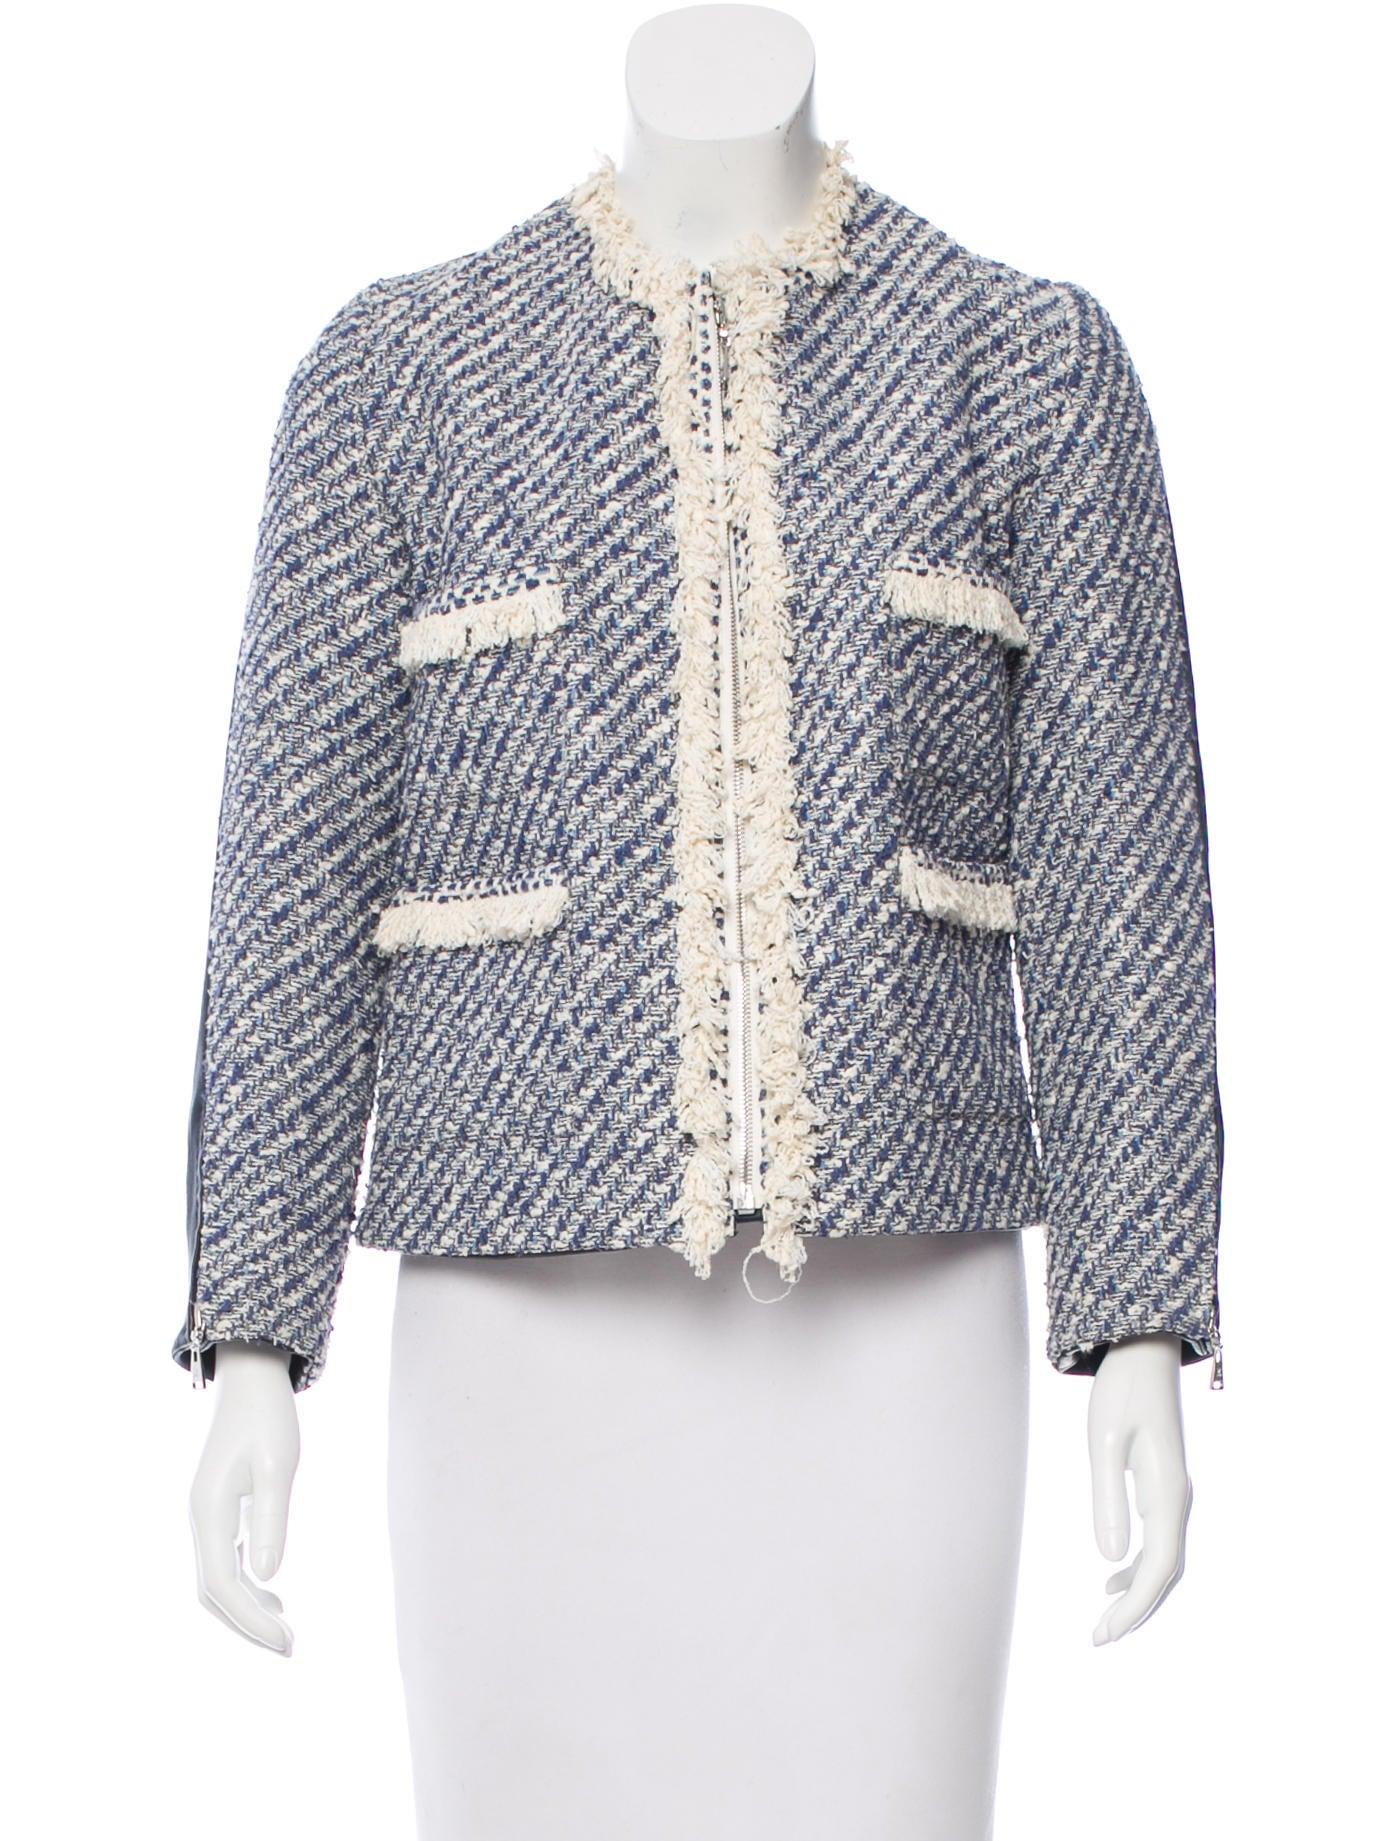 Tweed and leather jacket